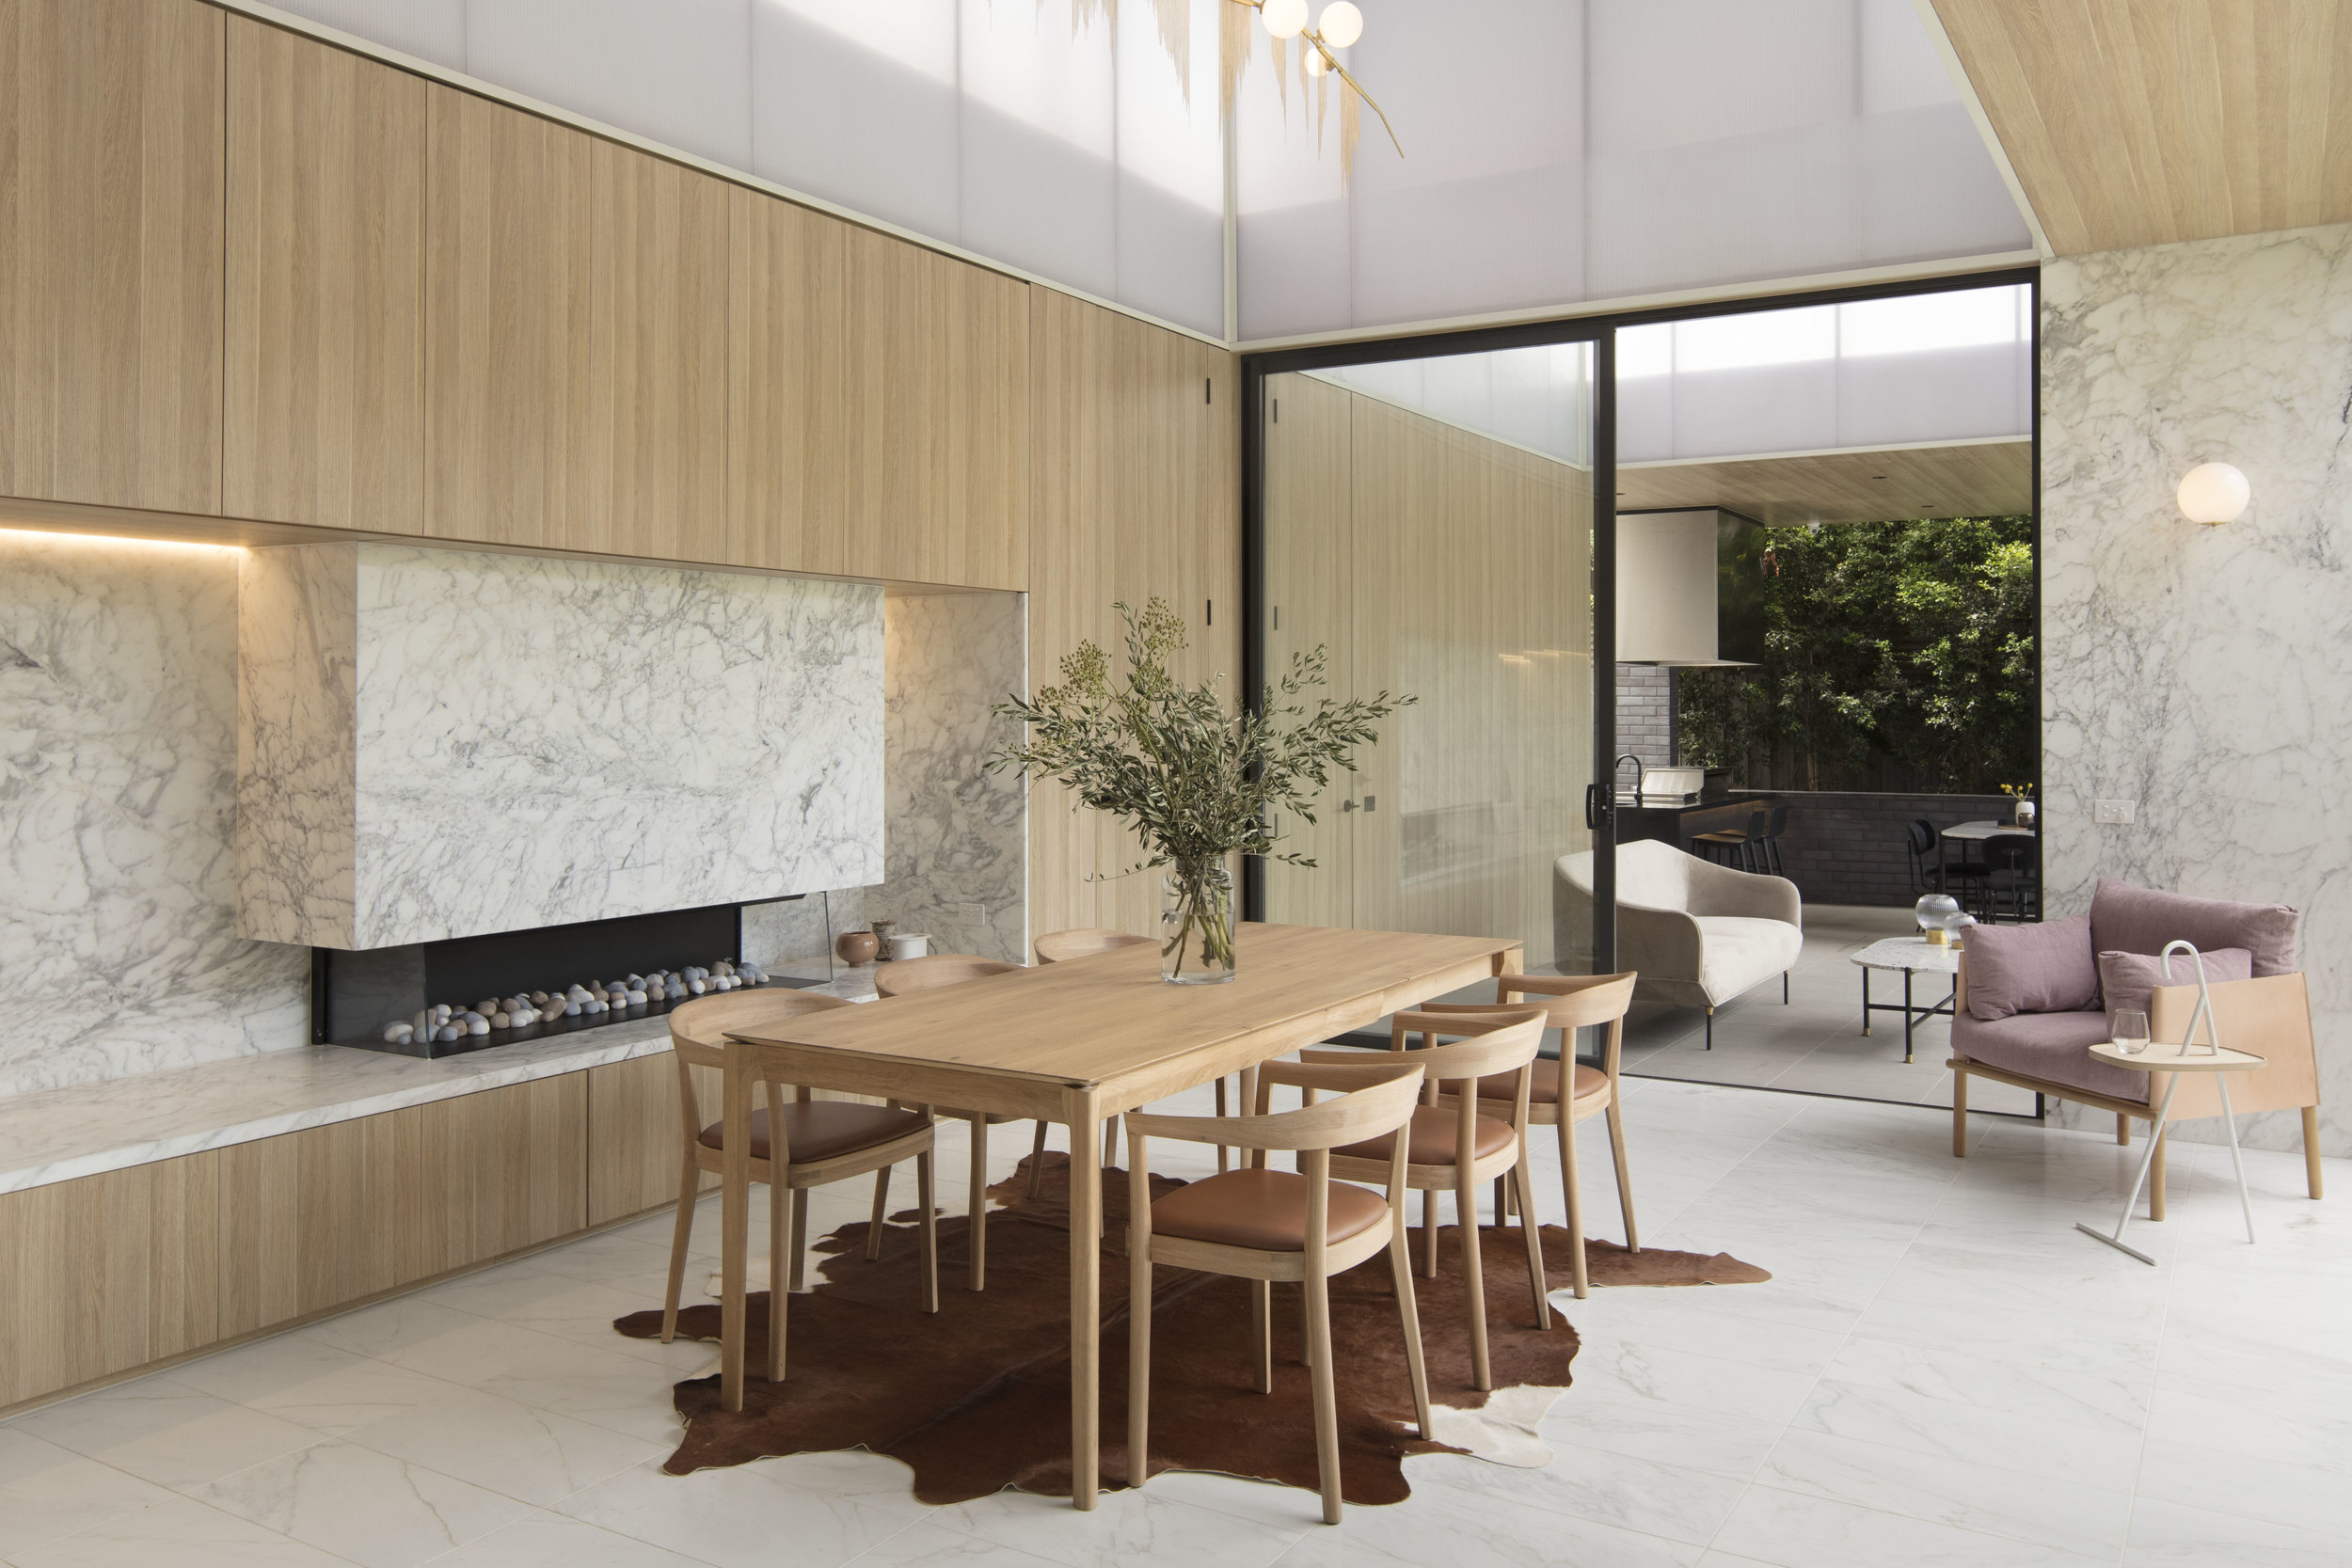 Pitch_Architecture_Lantern House_8